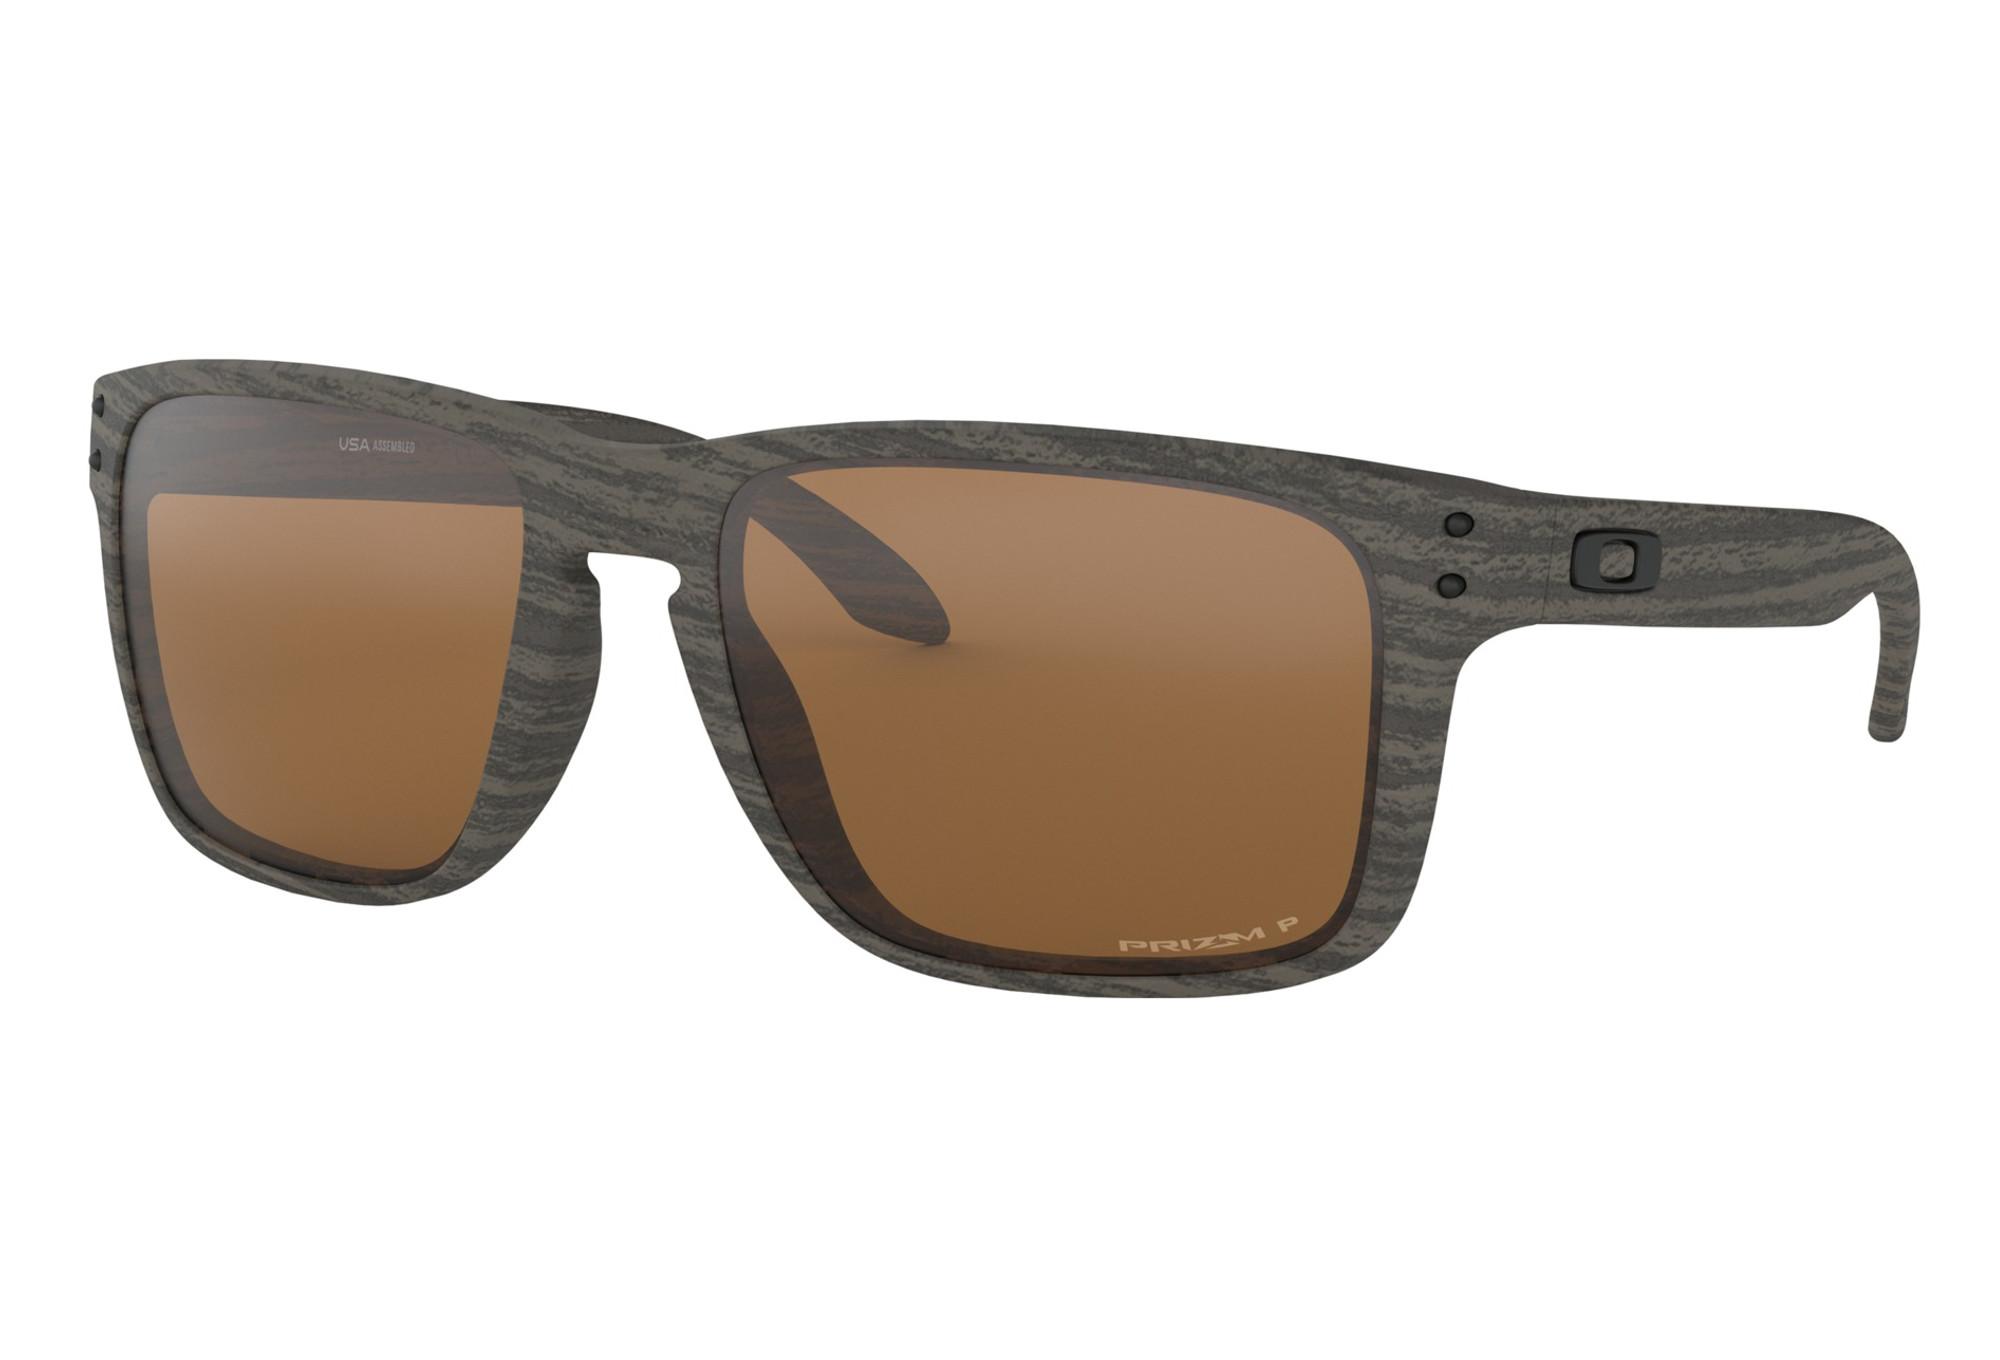 4be8bea3c4345 Gafas de sol Oakley Holbrook XL marrón - Prizm Polarized OO9417-0659 ...